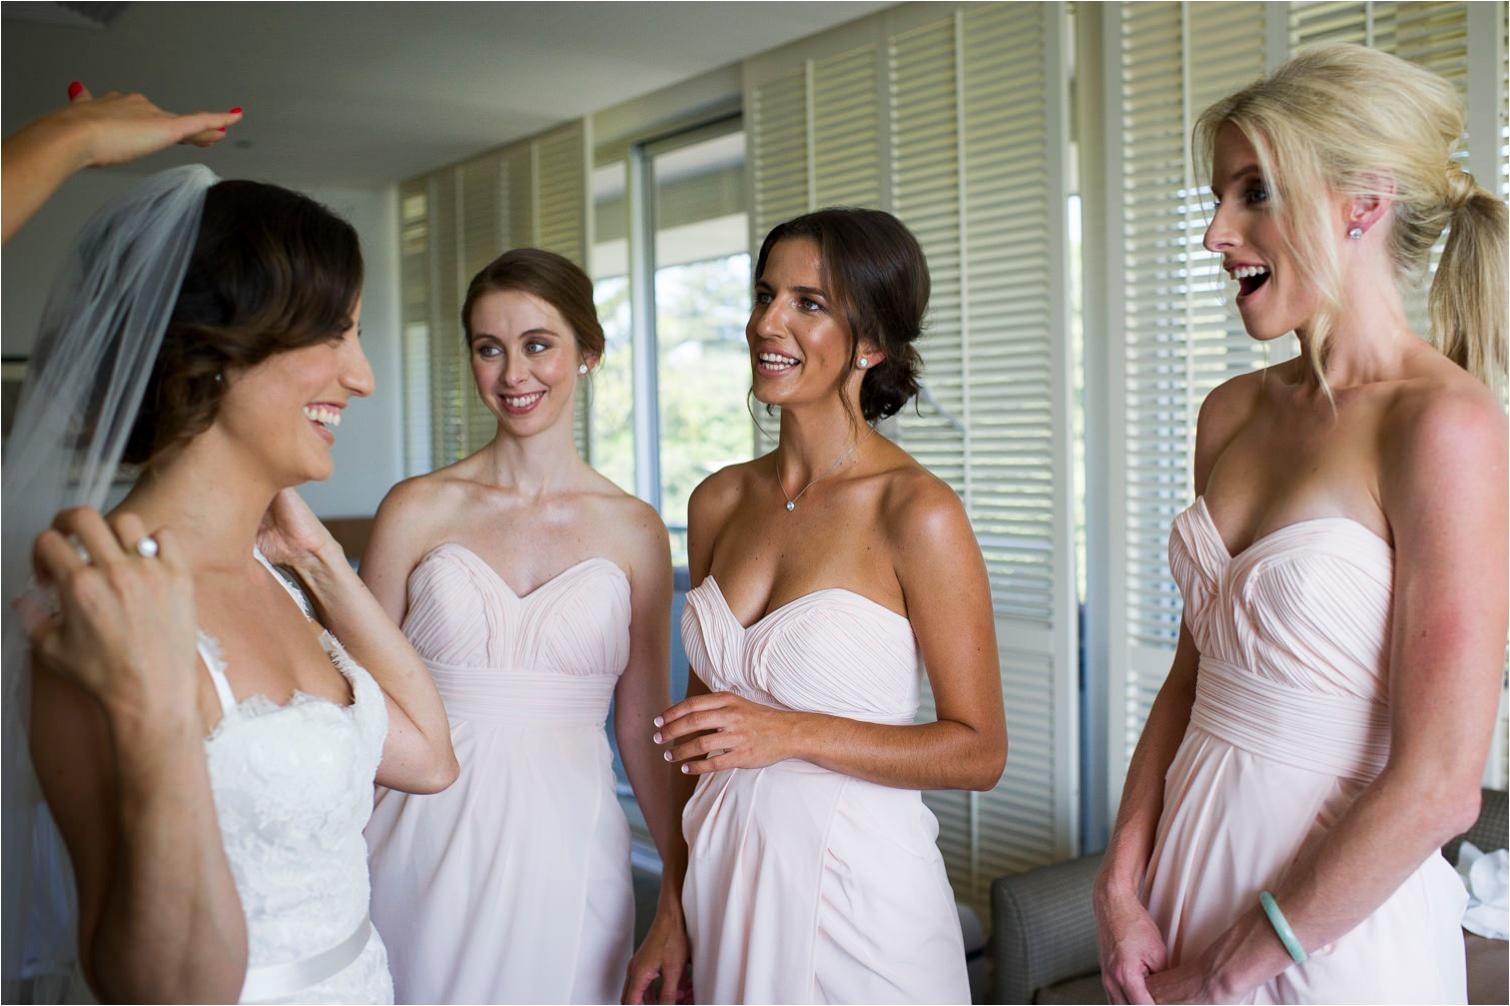 Nicole&Carlie_Watsons_Bay_Hotel_Wedding_by_Gold_Coast_Photographers-The_Follans7.jpg